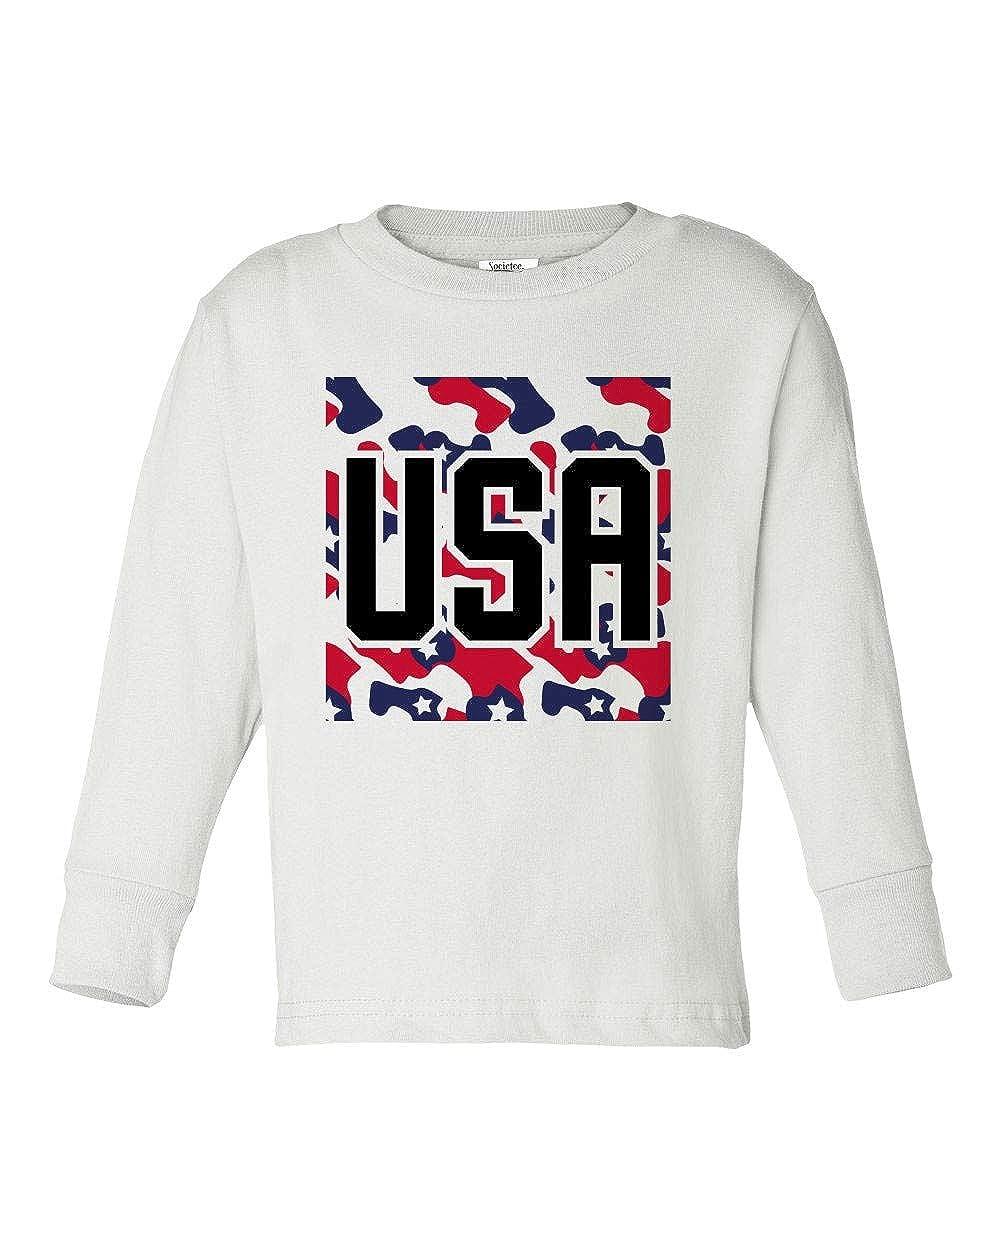 Societee Red White /& Blue Camouflage USA Girls Boys Toddler Long Sleeve T-Shirt